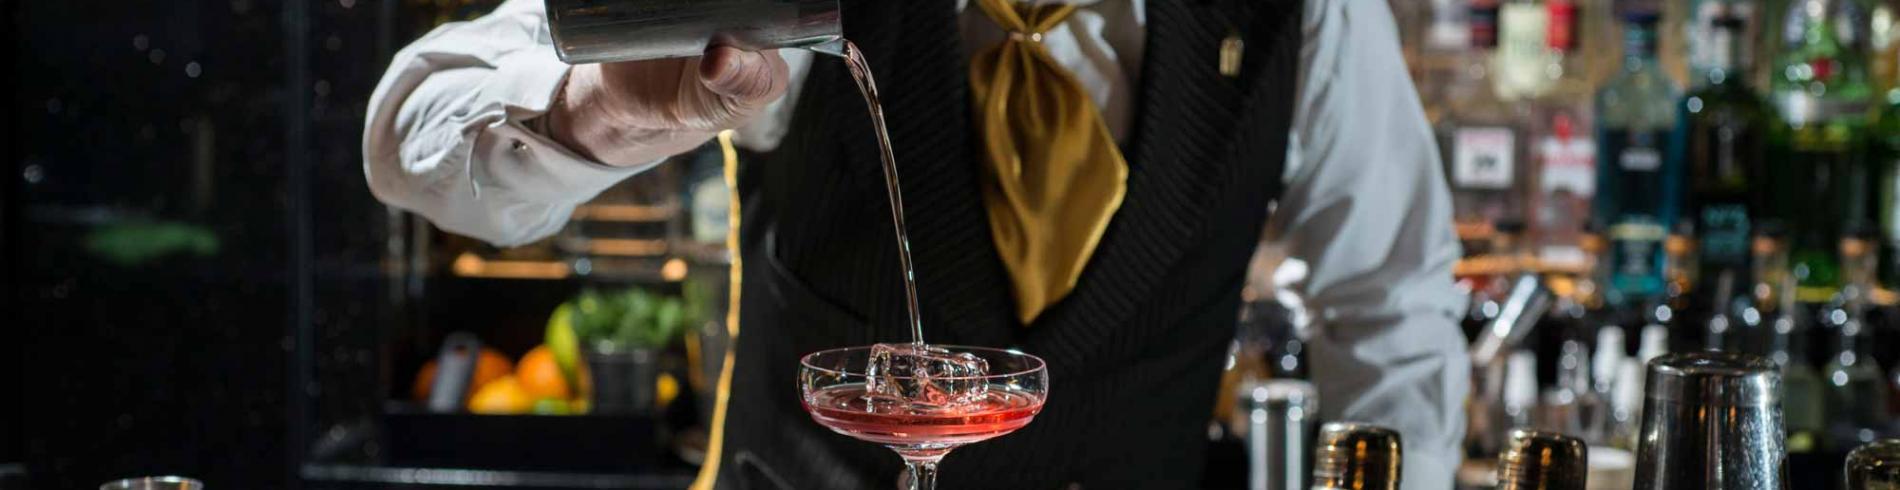 A bartender pours a drink at Beaufort Bar